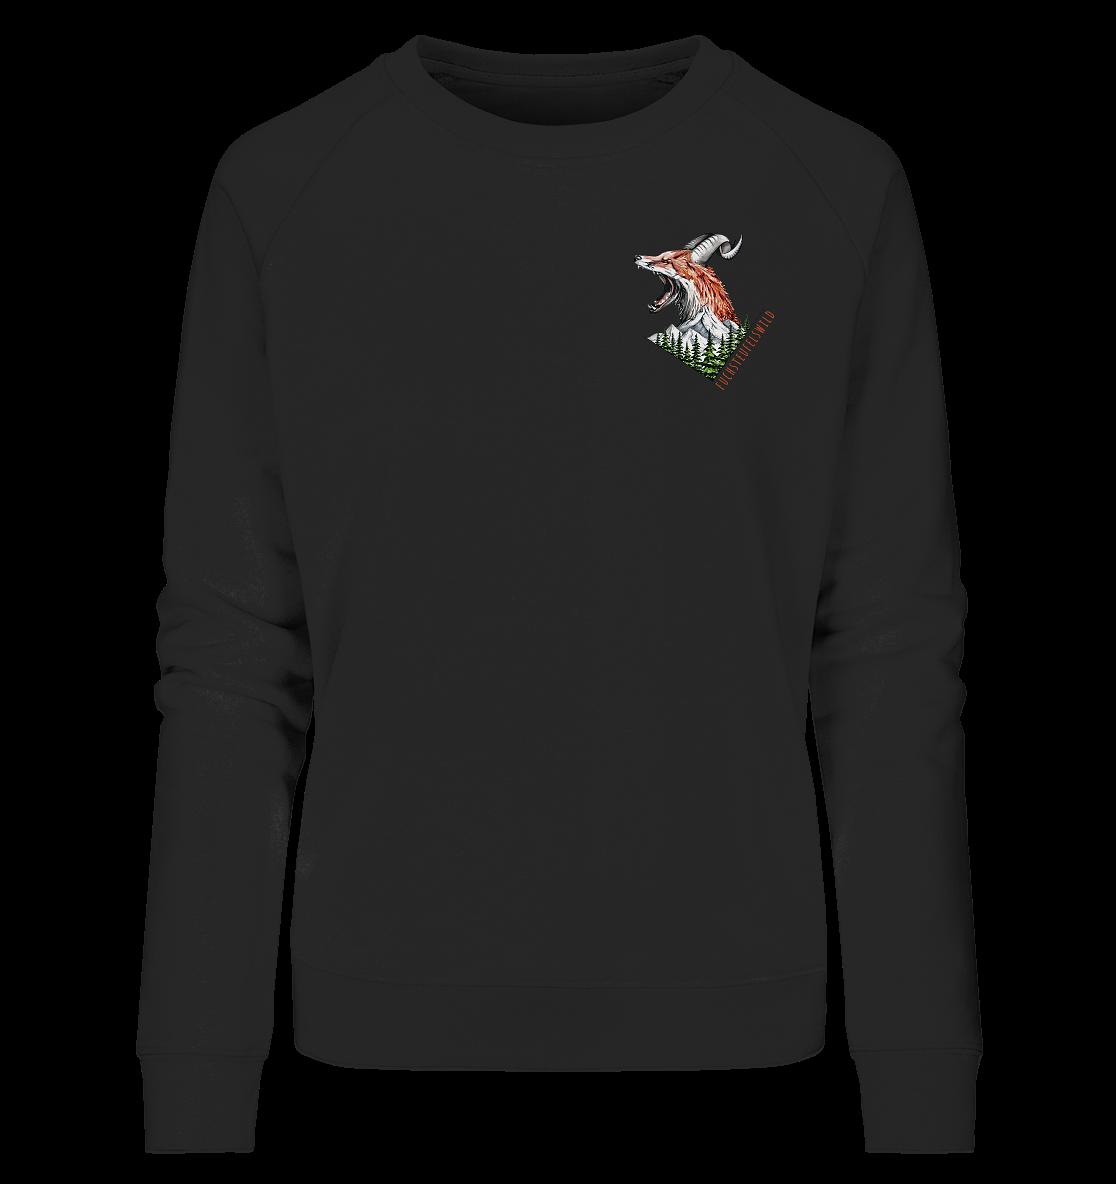 front-ladies-organic-sweatshirt-272727-1116x-2.png